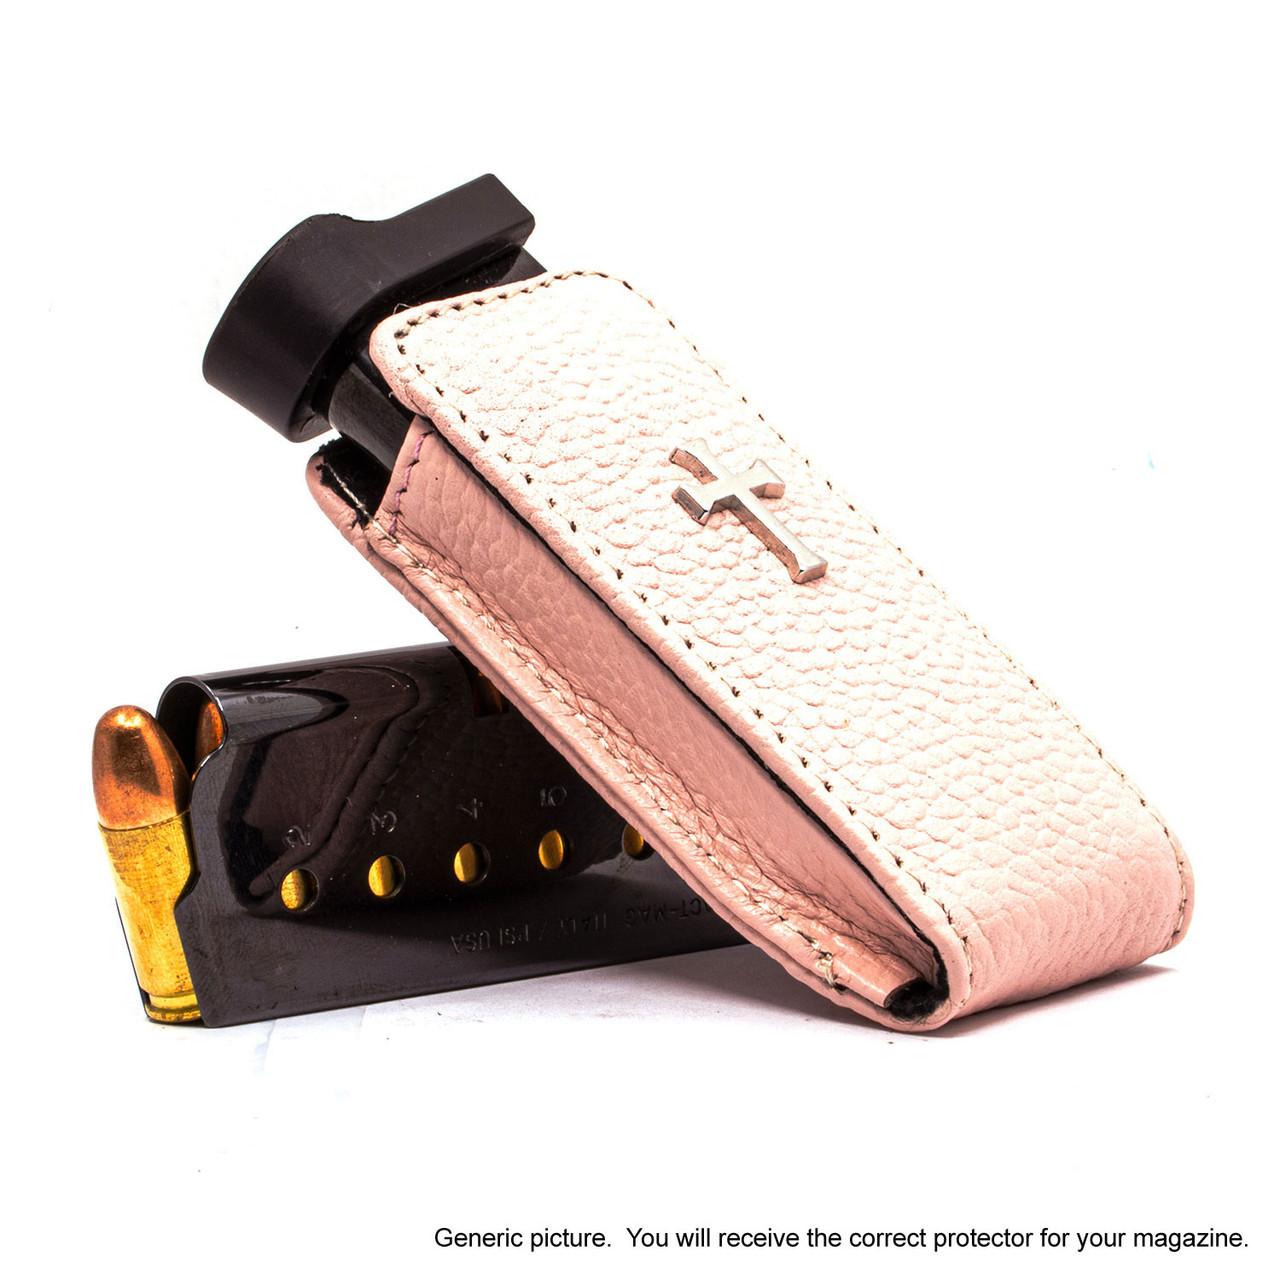 CZ 75 P07 Pink Carry Faithfully Cross Magazine Pocket Protector